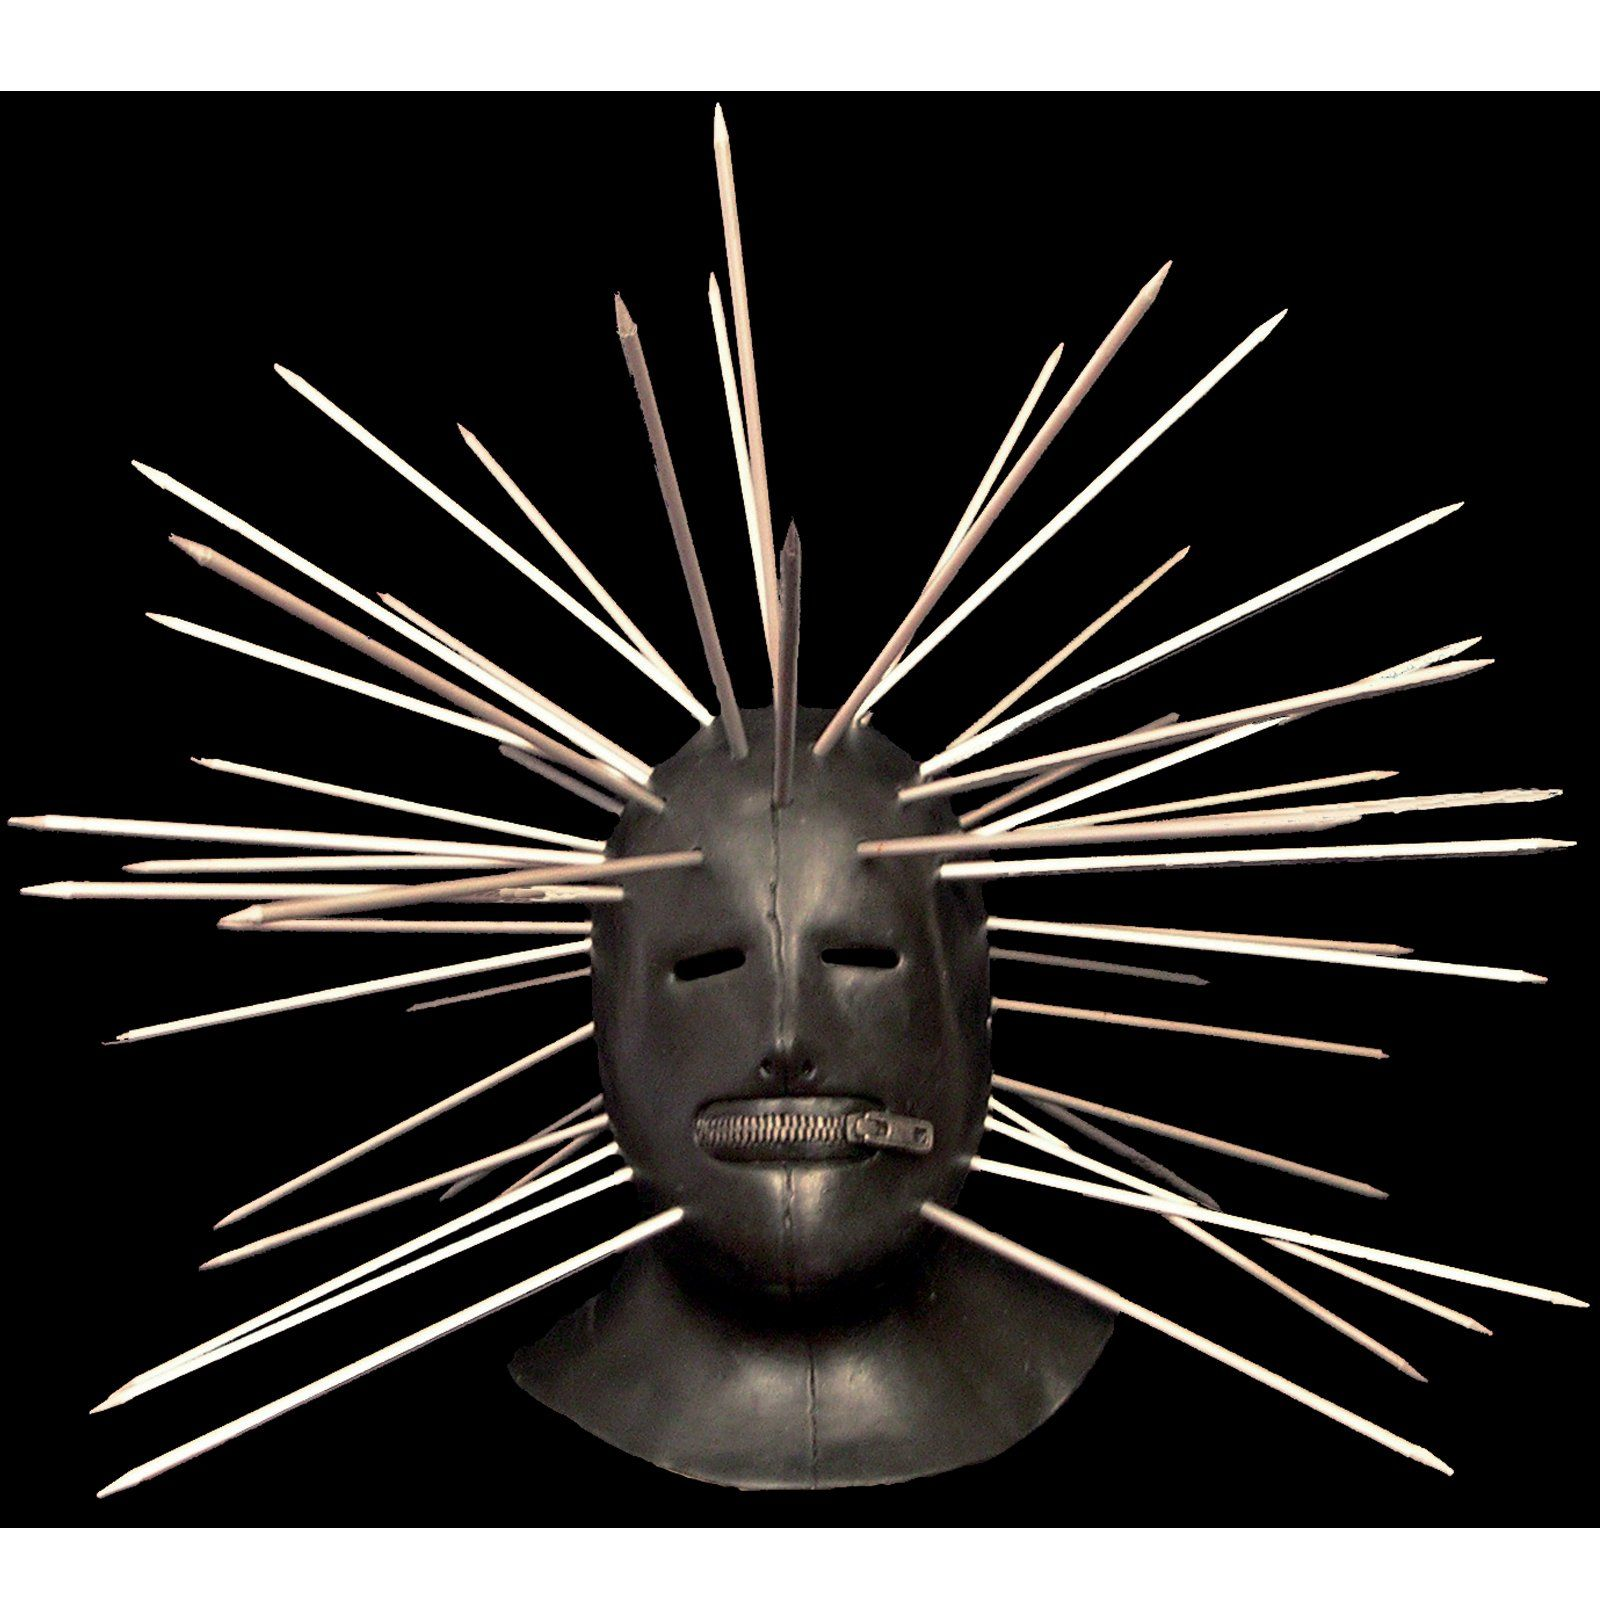 Craig Jones Mask from Slipknot | #5 Craig Jones ...